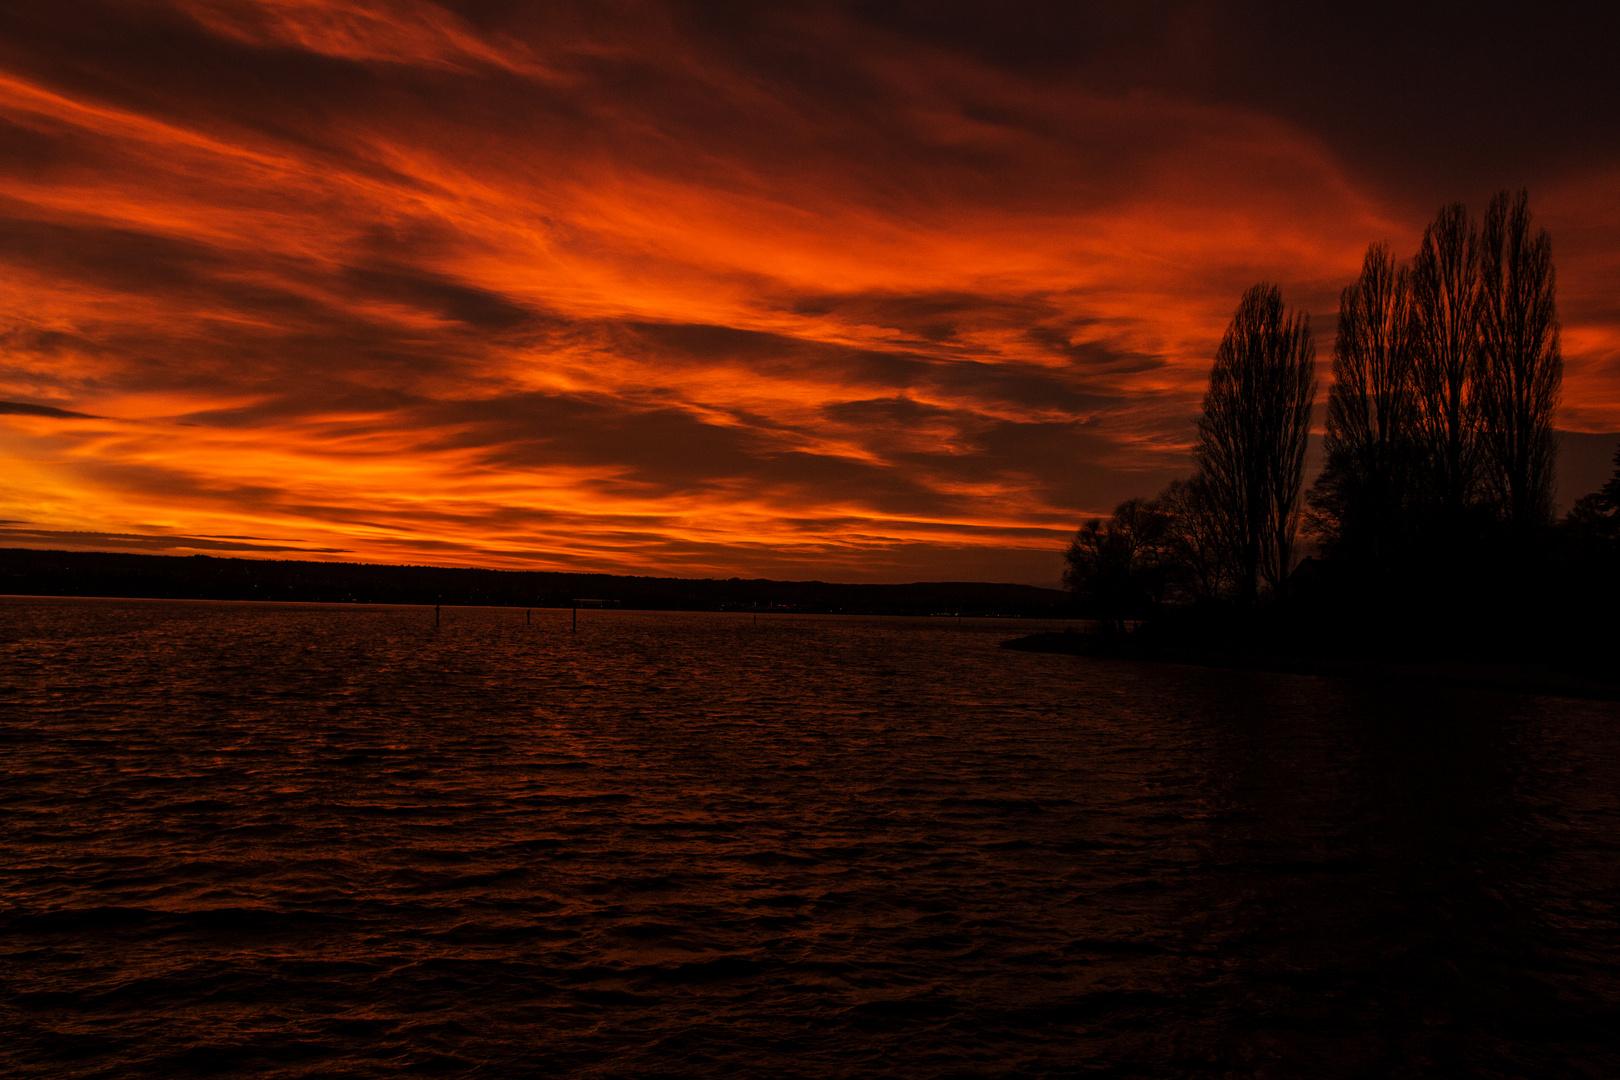 letzter Sonnenuntergang im Advent